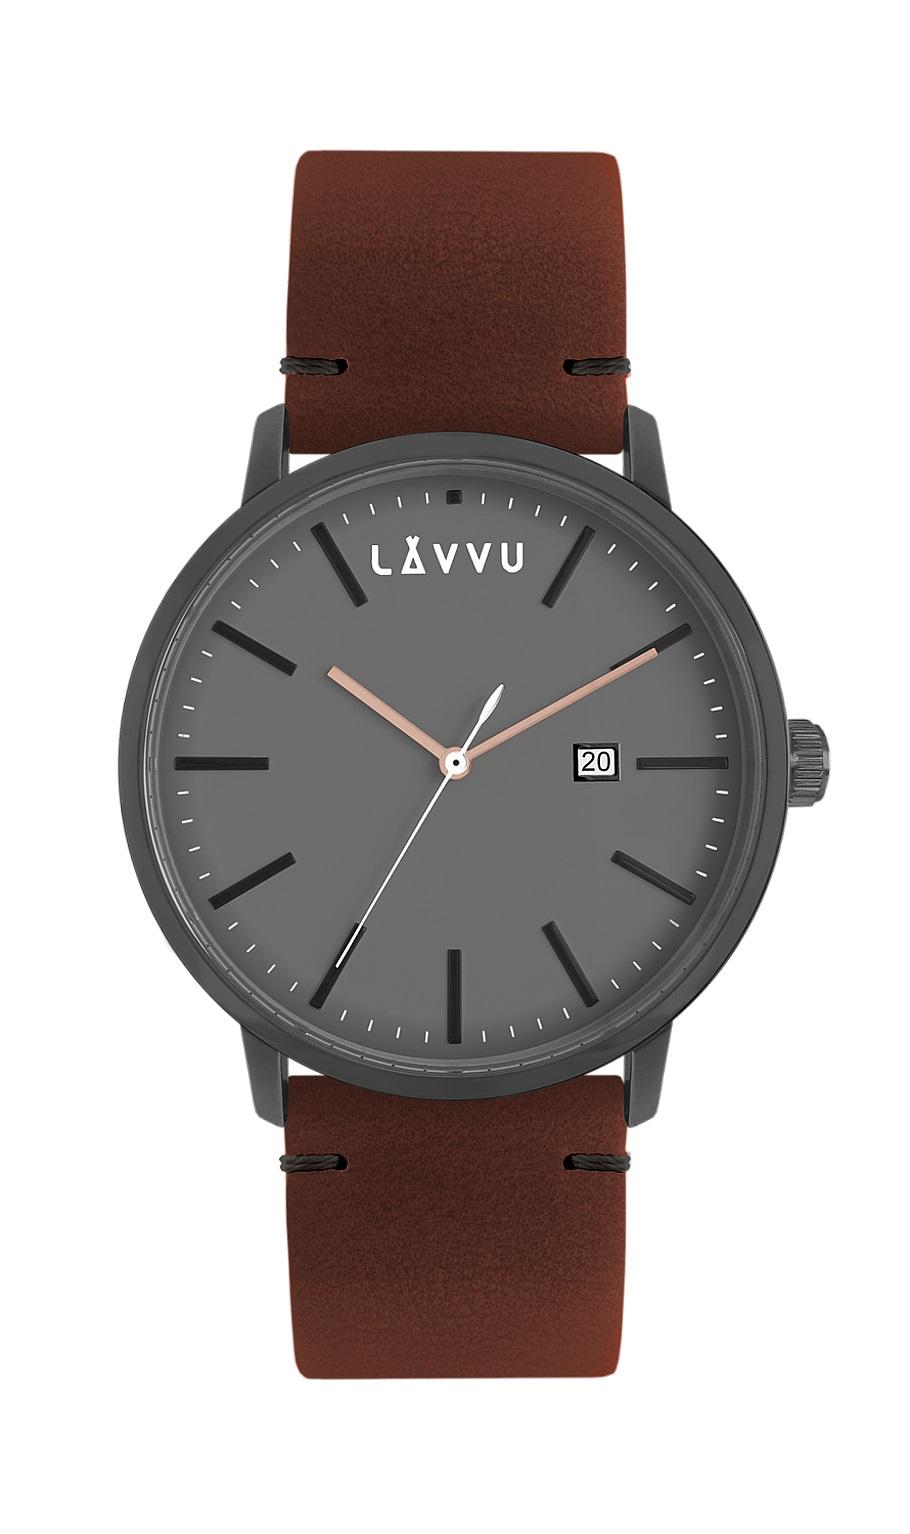 Červeno-hnědé pánské hodinky LAVVU COPENHAGEN WOODS s koženým páskem LWM0033 (POŠTOVNÉ ZDARMA!!! LWM0033)